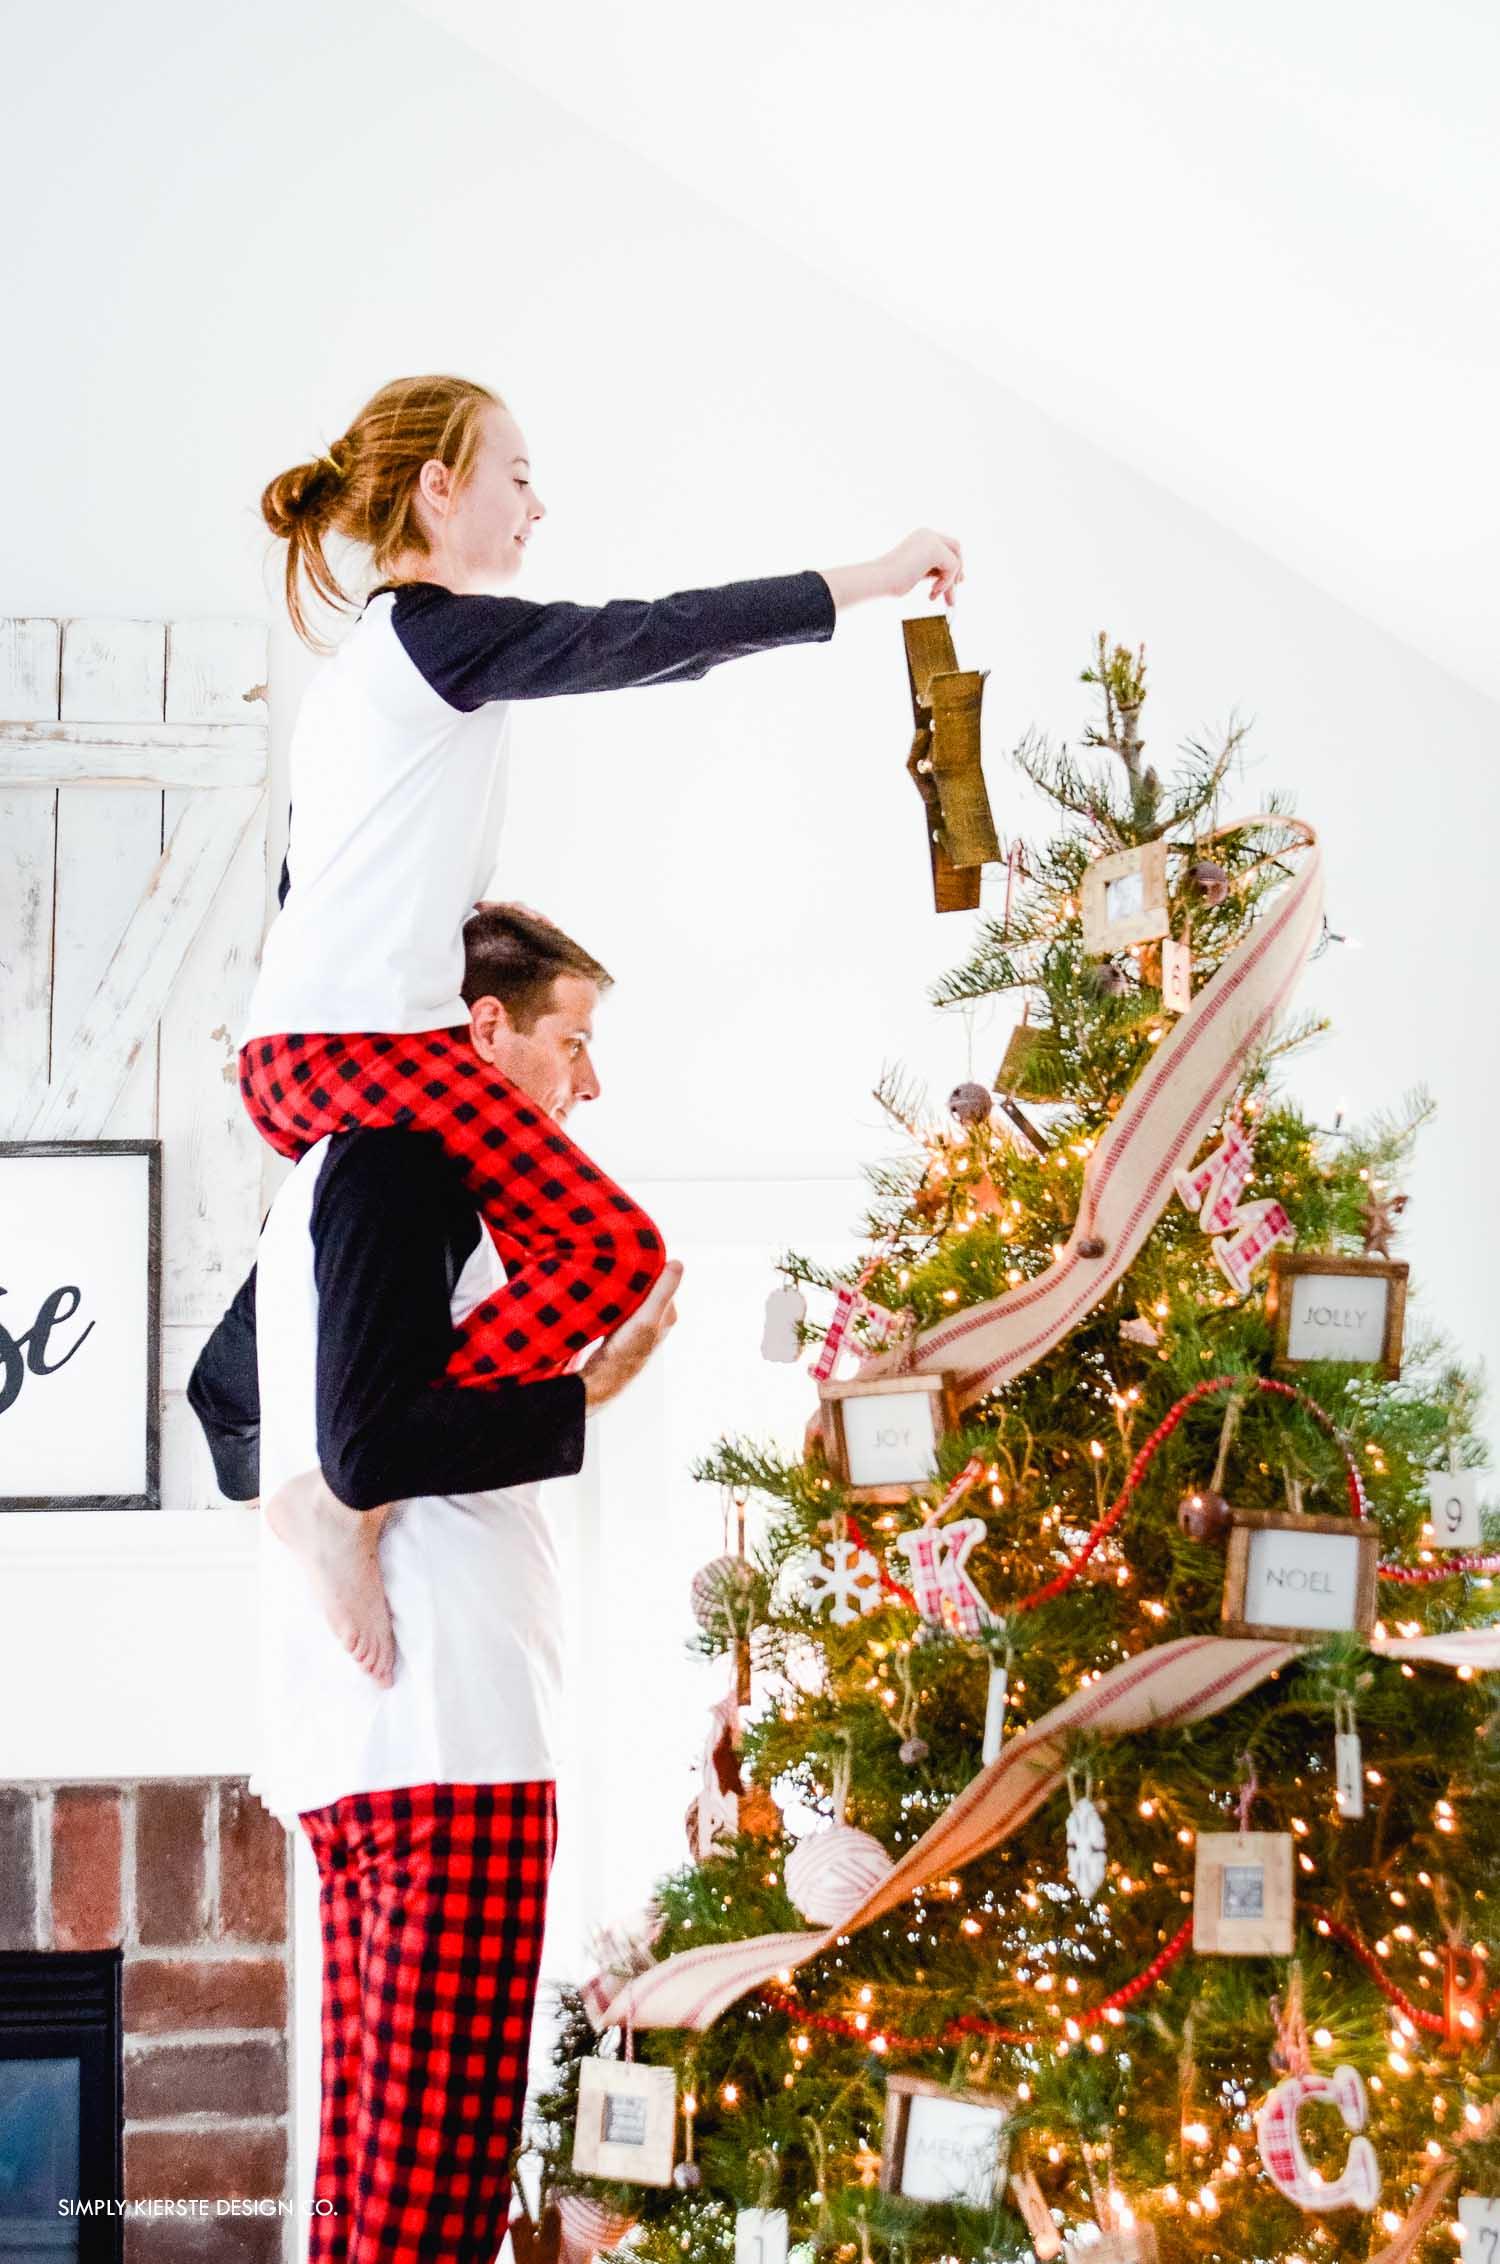 Old Salt Farm Christmas Home Tour 2017 - Simply Kierste Design Co.